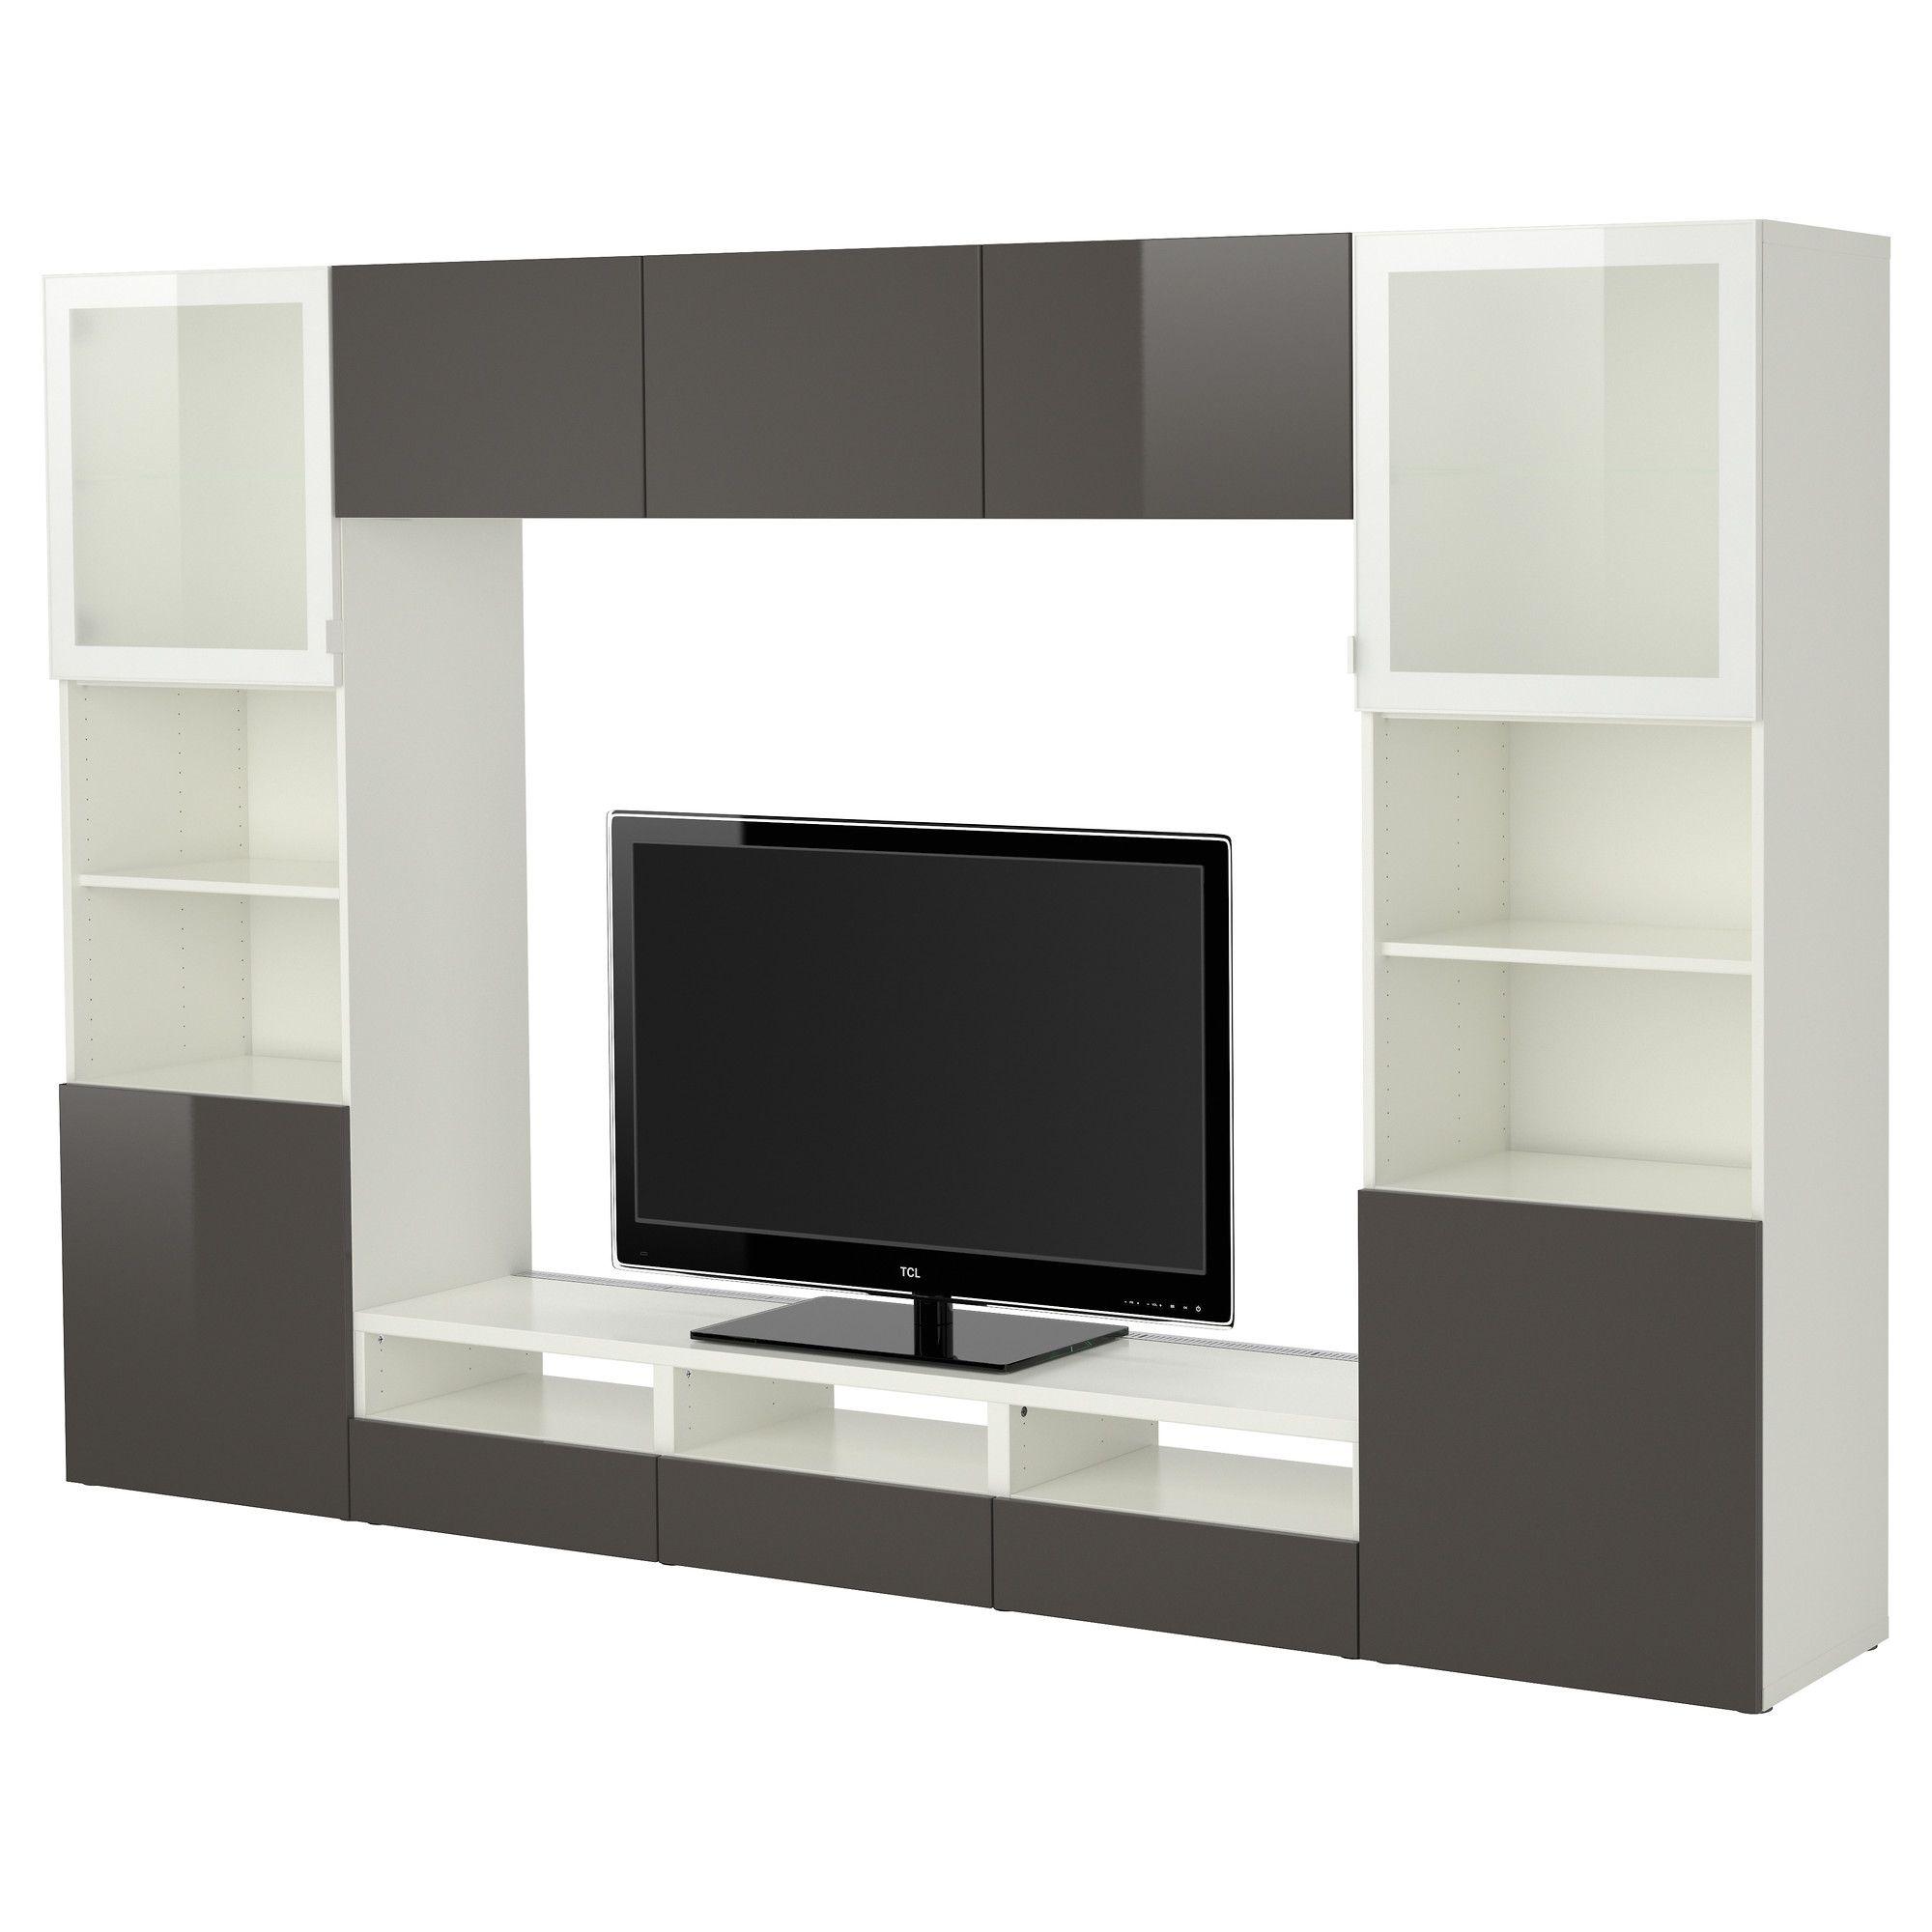 Best Combinaison Rangt Tv Vitrines Blanc Tofta Brillant Gris  # Ikea Meuble Vitrine D'Angle Salon